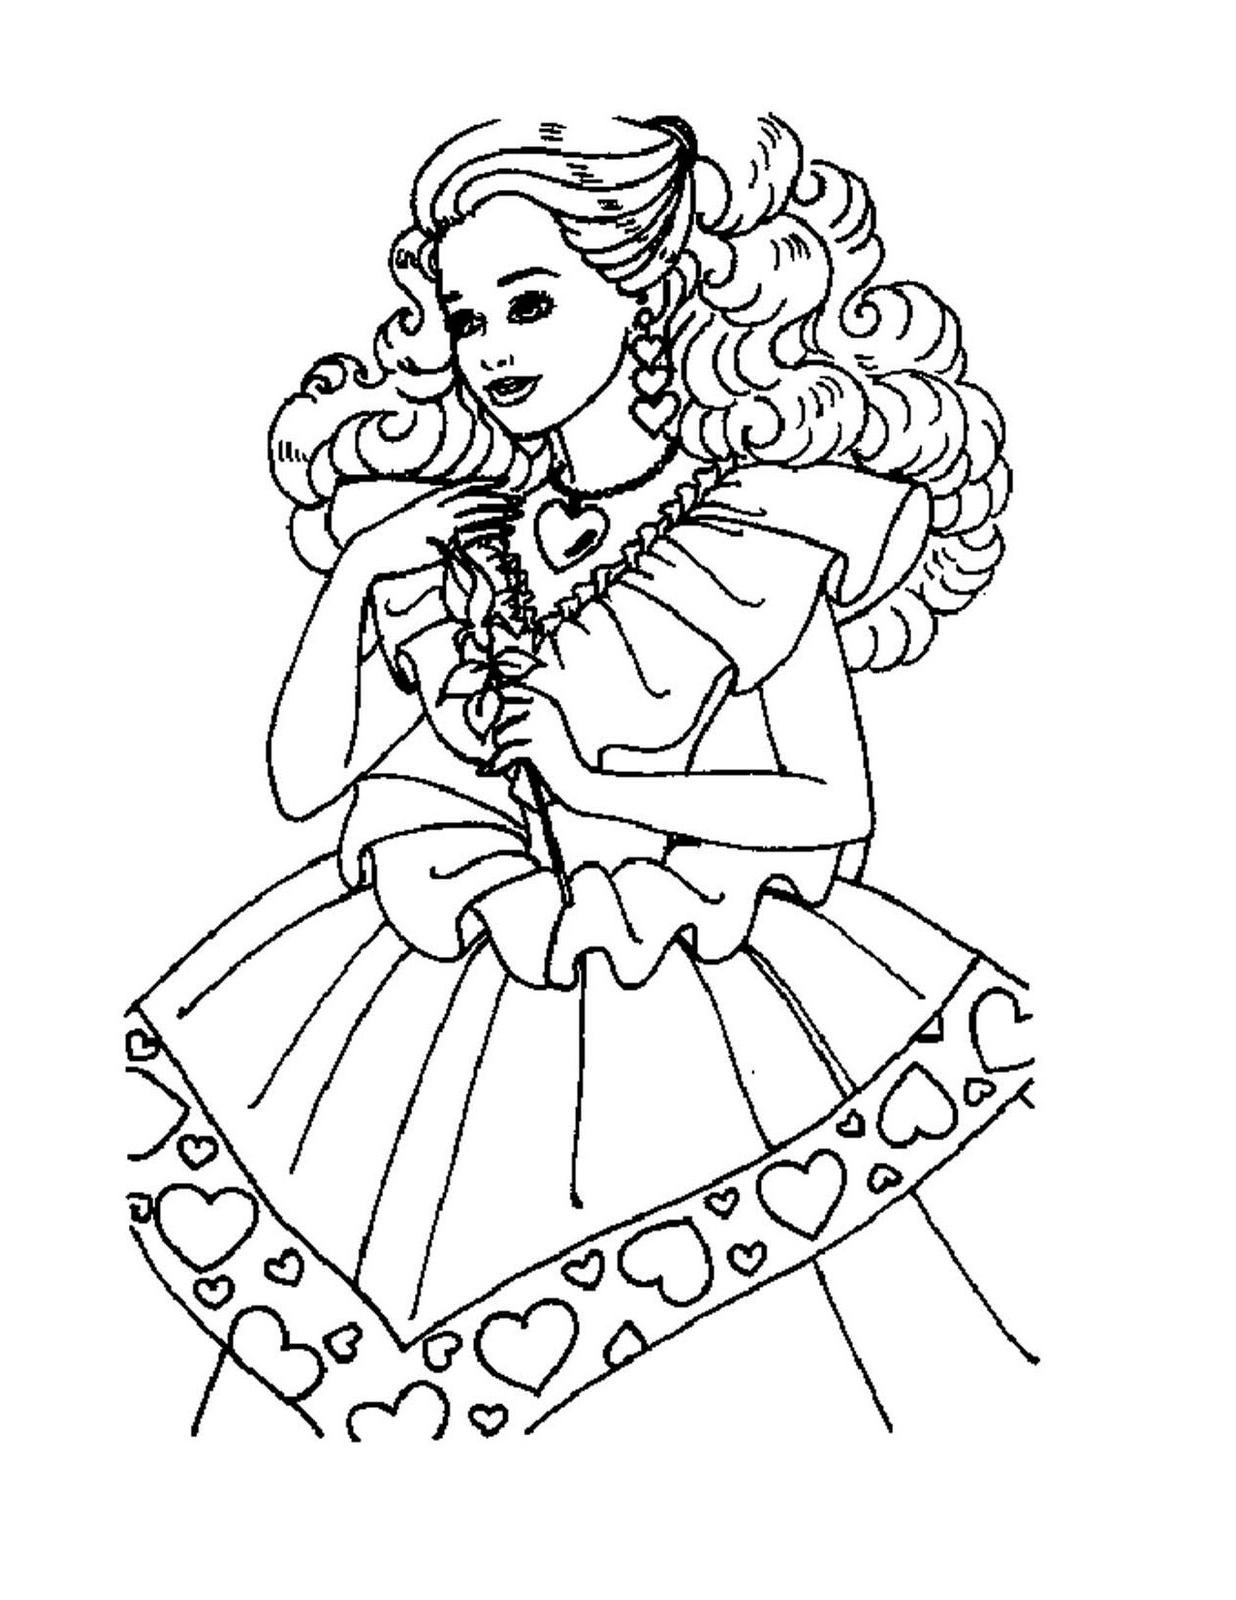 Barbie Princess Coloring Pages at GetDrawings | Free download